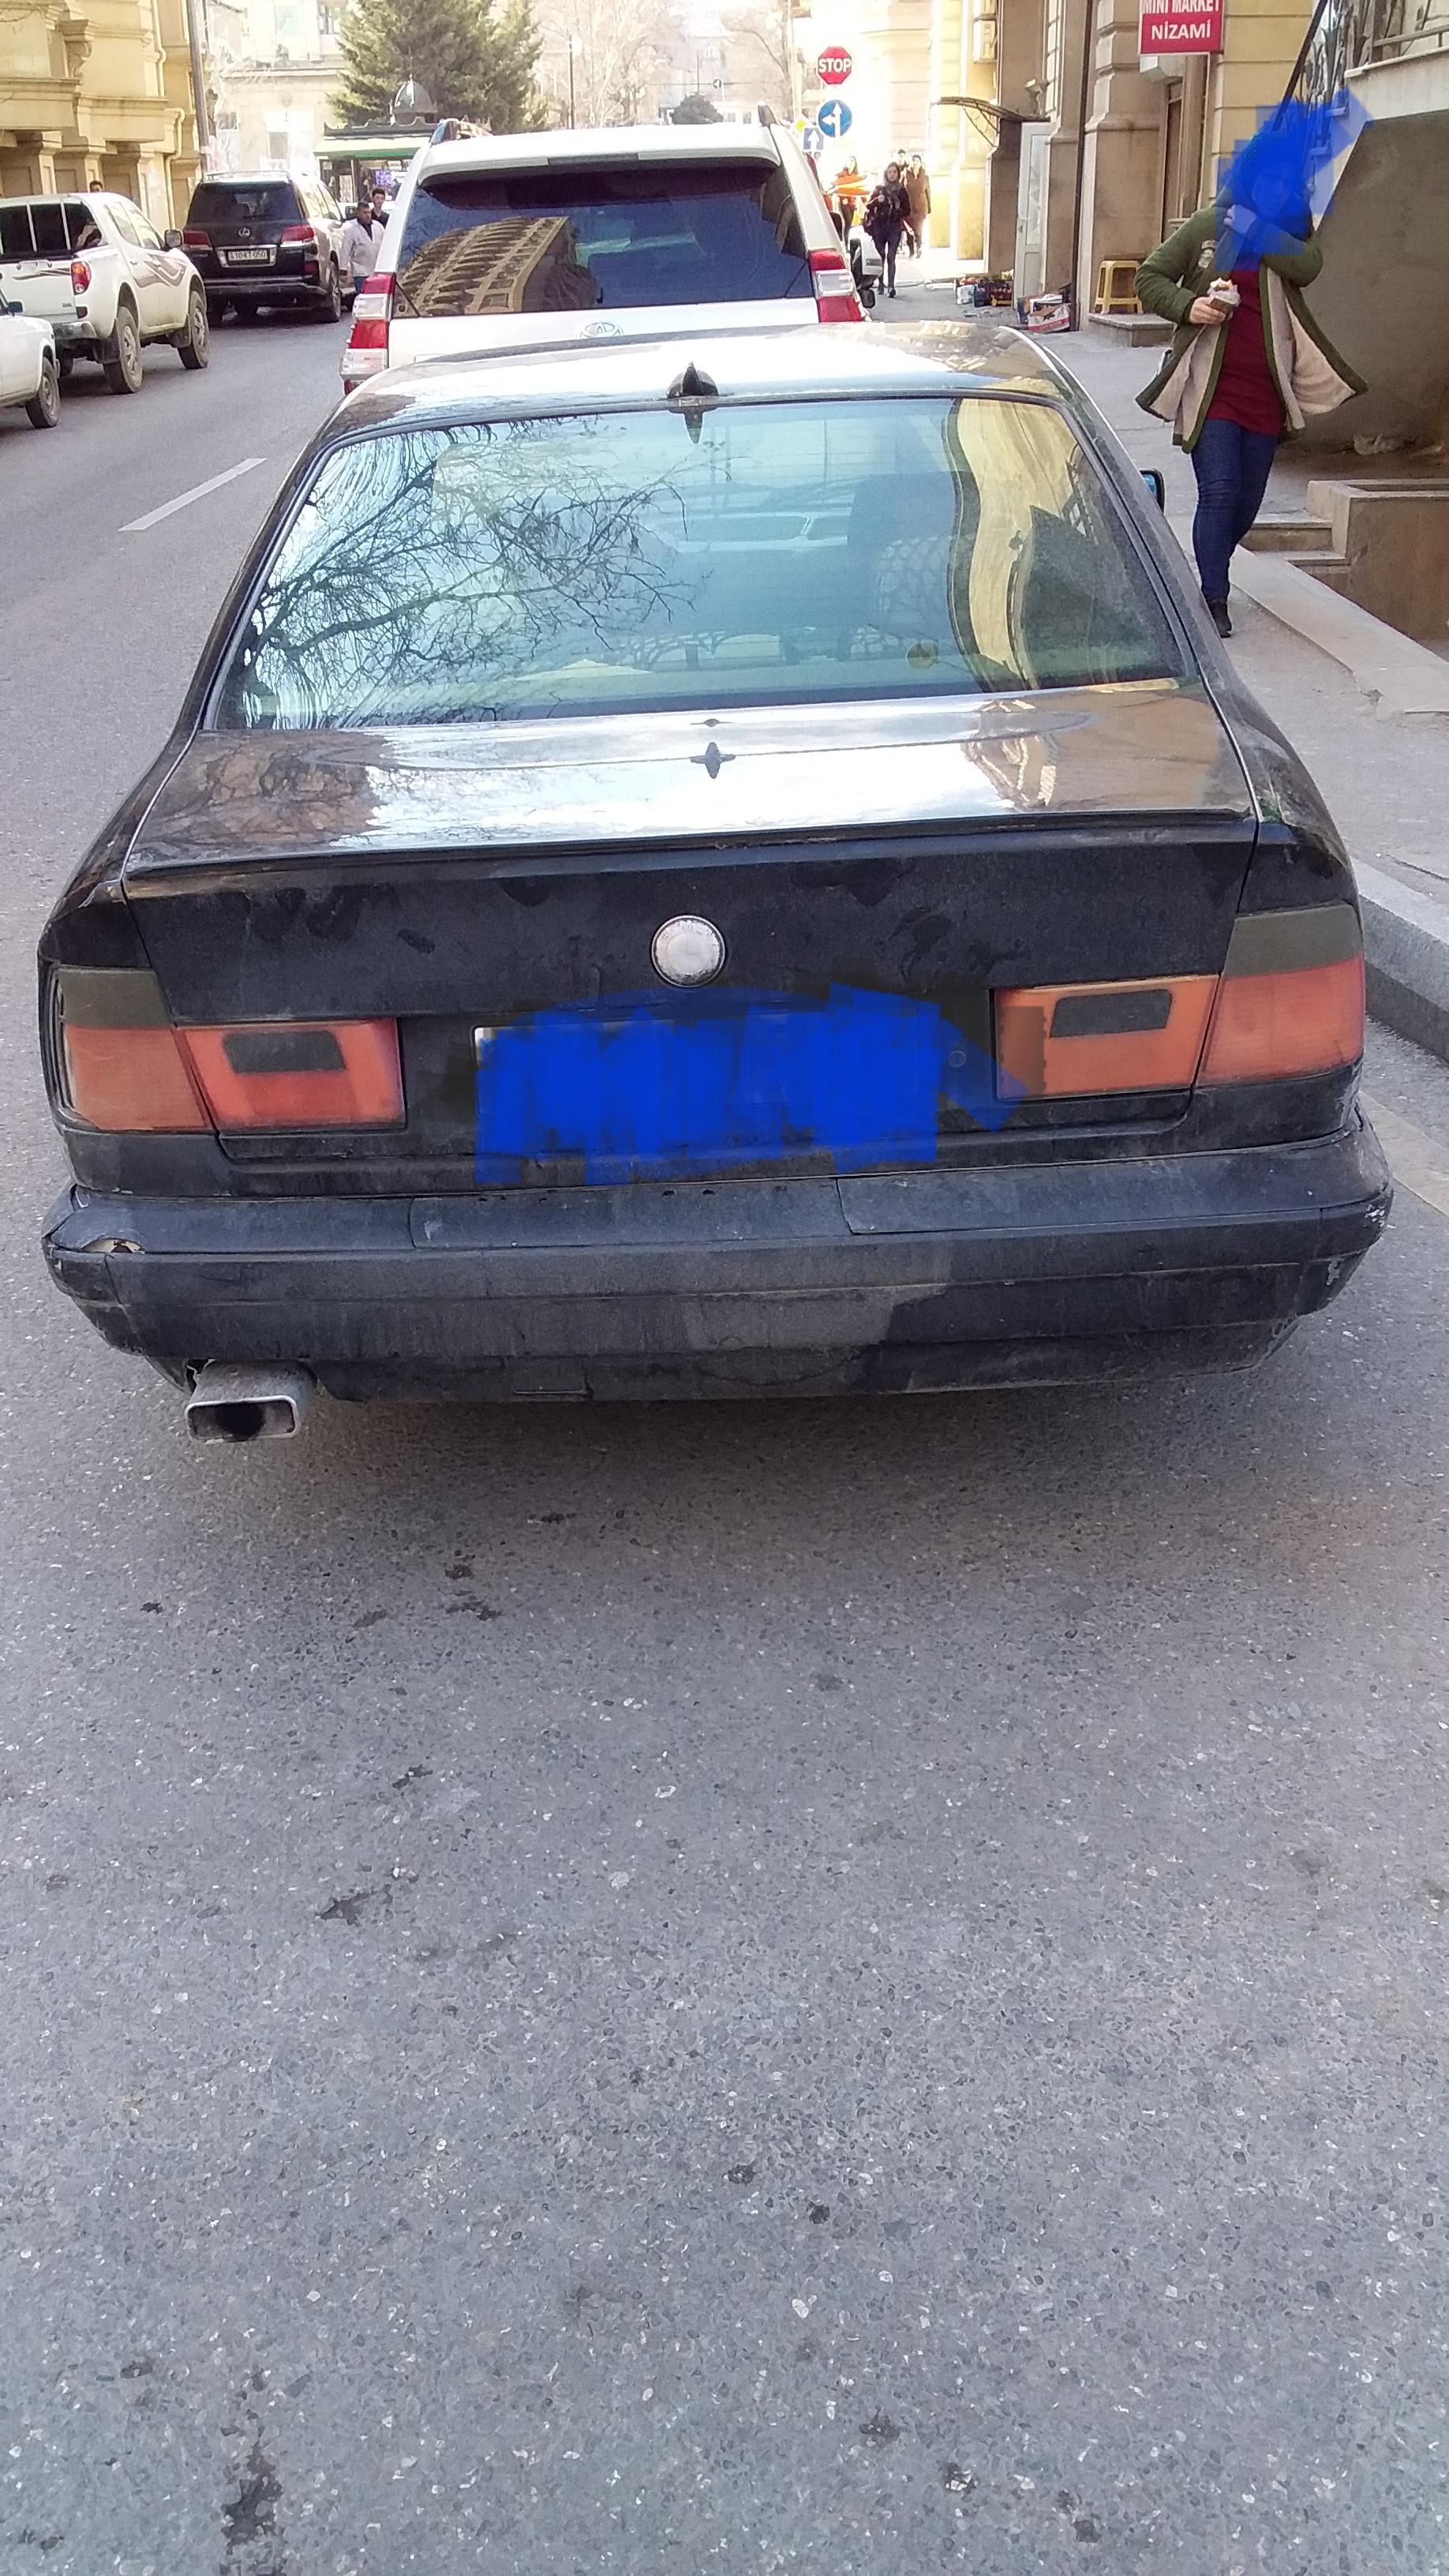 BMW 520 2.0(lt) 1989 Second hand  $2400